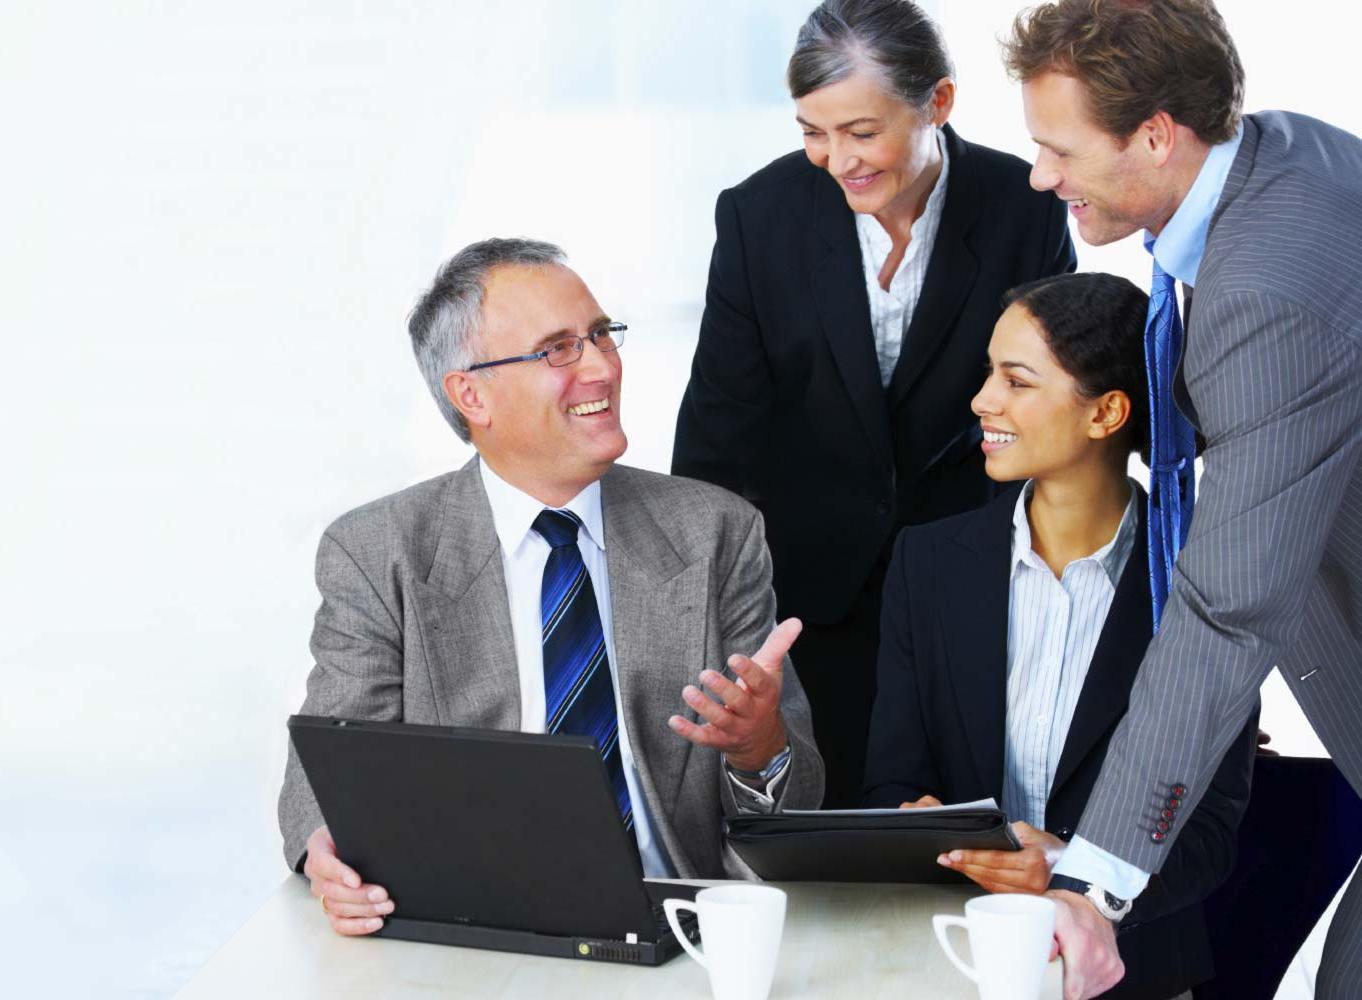 Pengertian Kepemimpinan Menurut Para Ahli - TipsSerbaSerbi